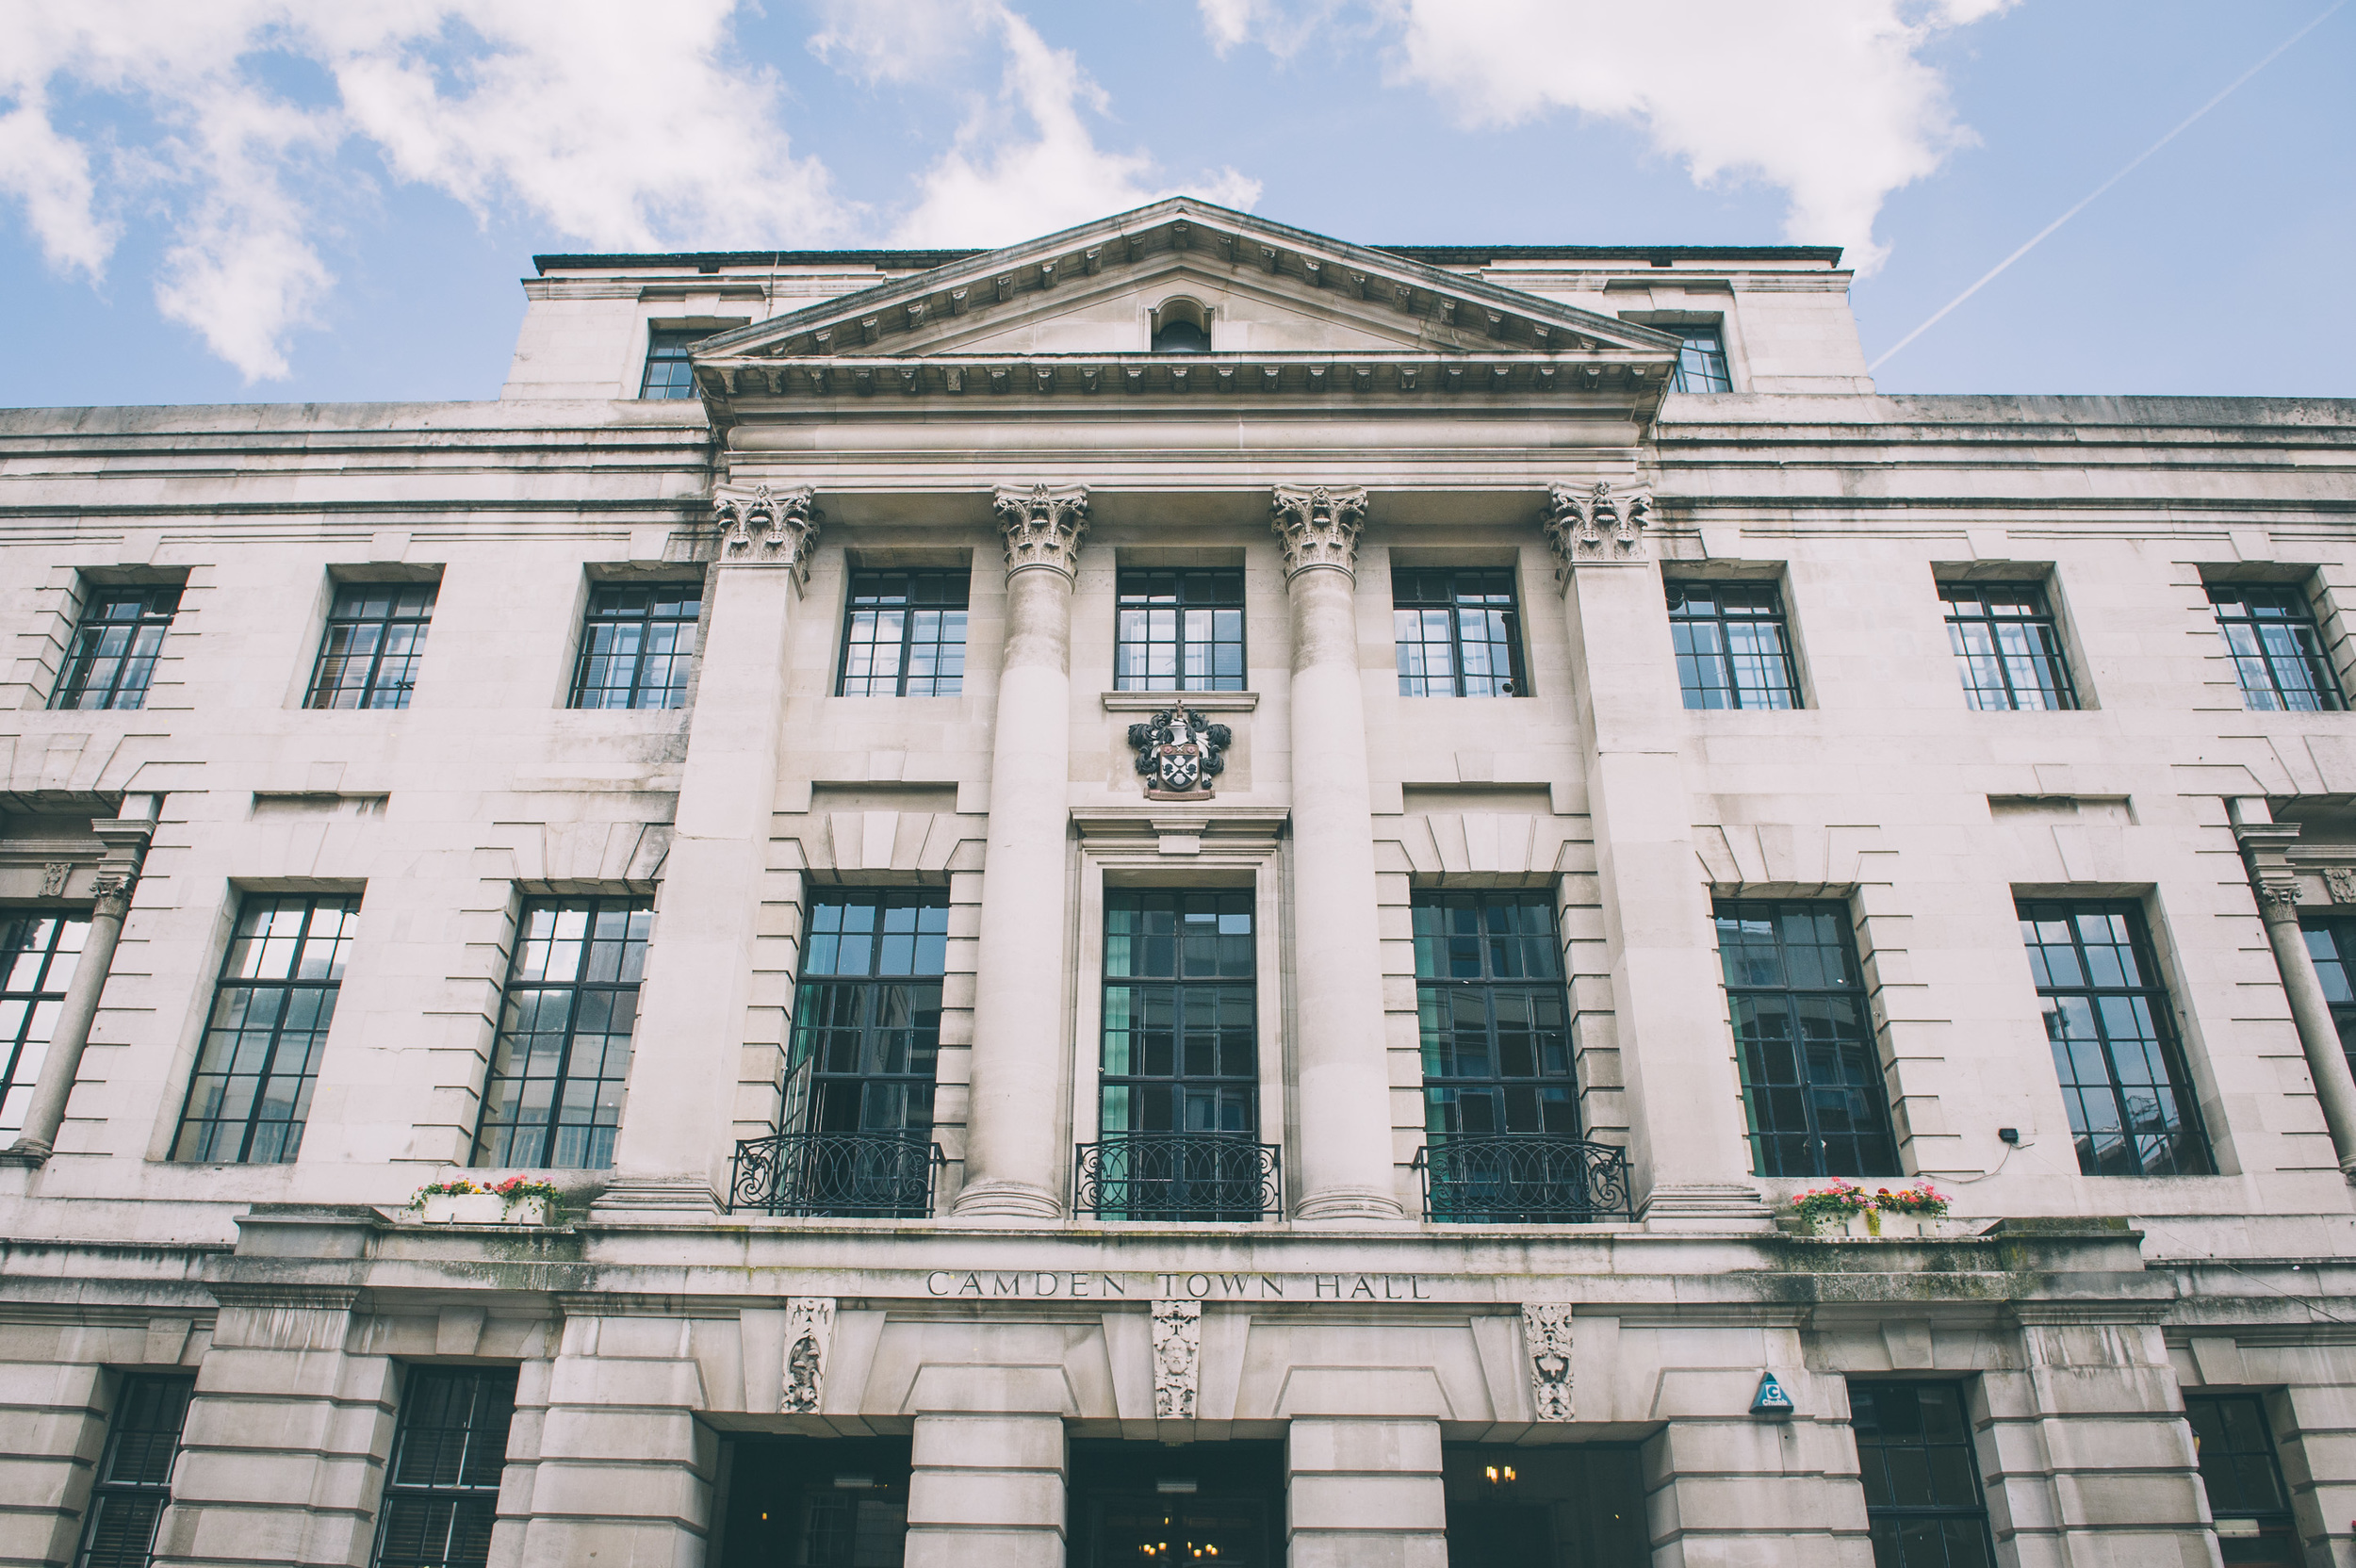 camden town hall London